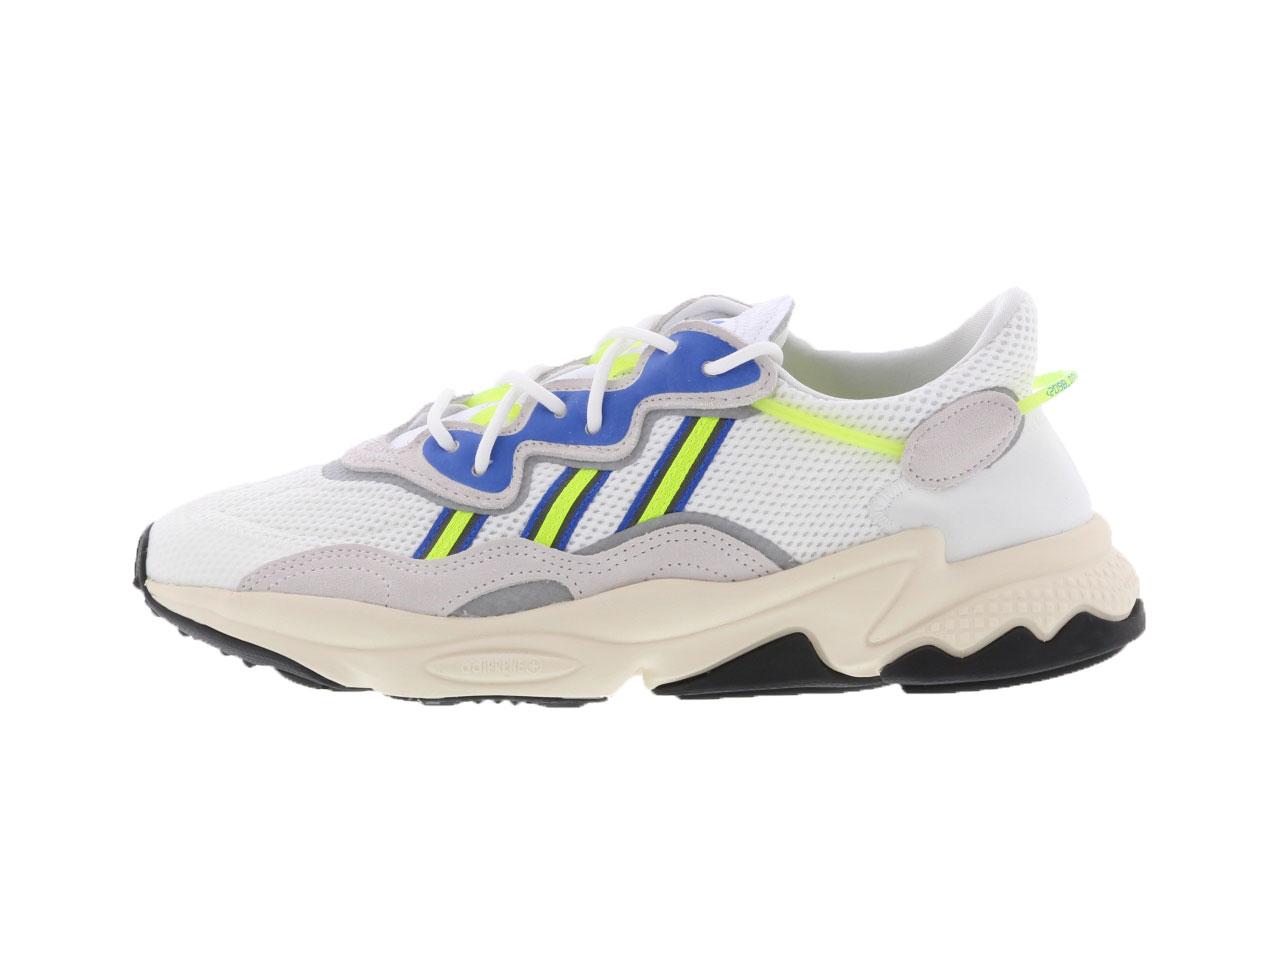 adidas Originals OZWEEGO(EE7009)【アディダス】【メンズファッション】【シューズ】【靴】【スニーカー】【フットウェア】【ストアレビュー記載でソックスプレゼント対象品】